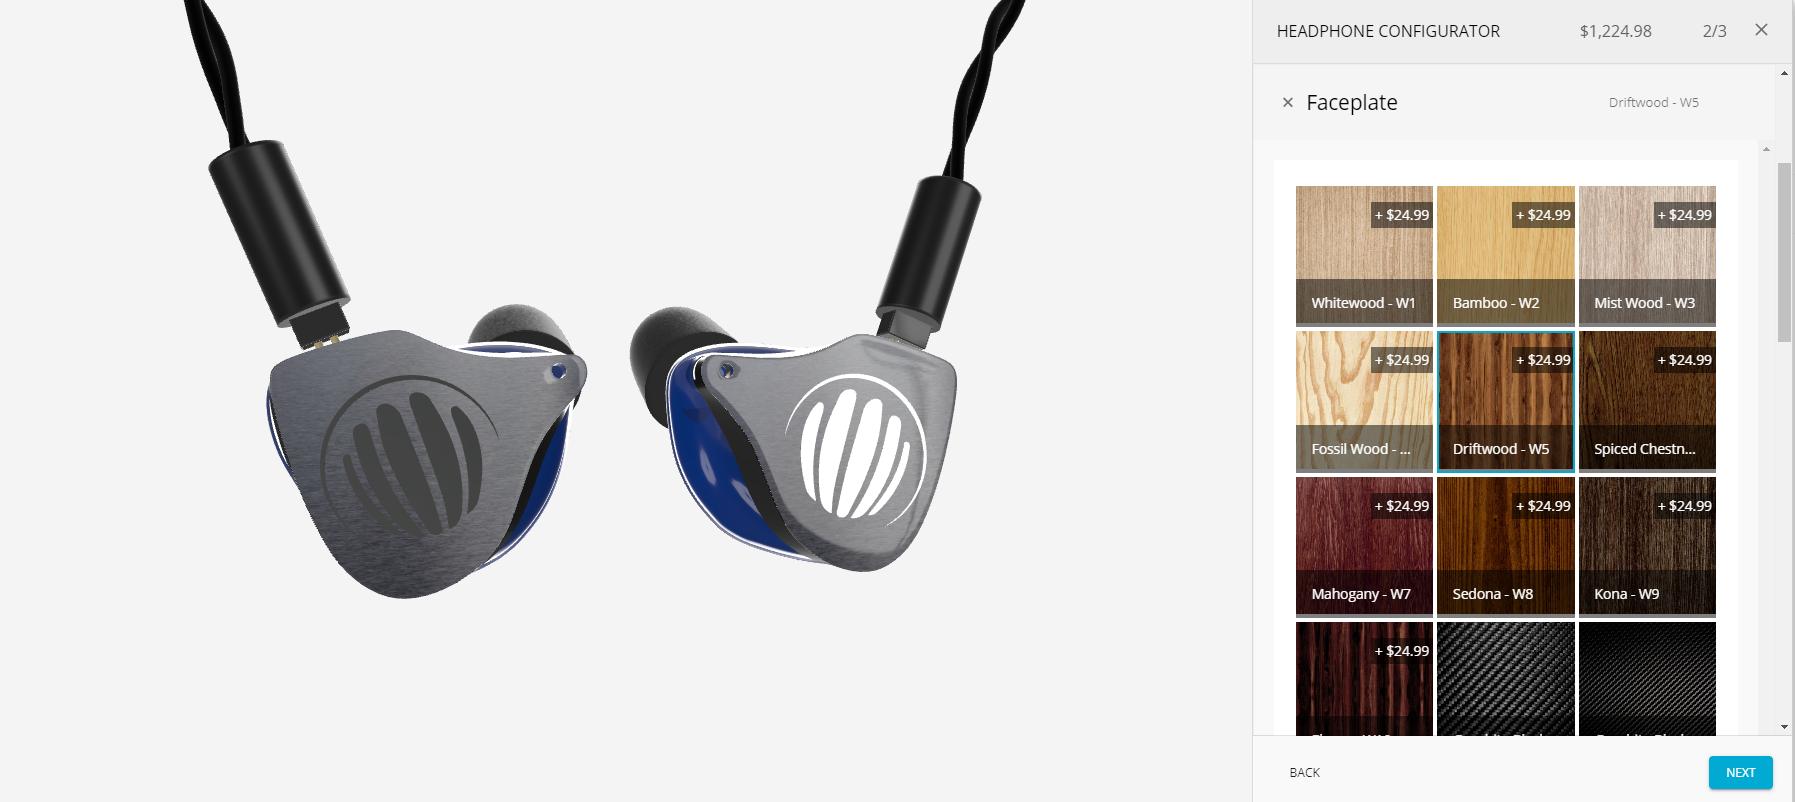 Earplugs - materials customization, 3D rendering